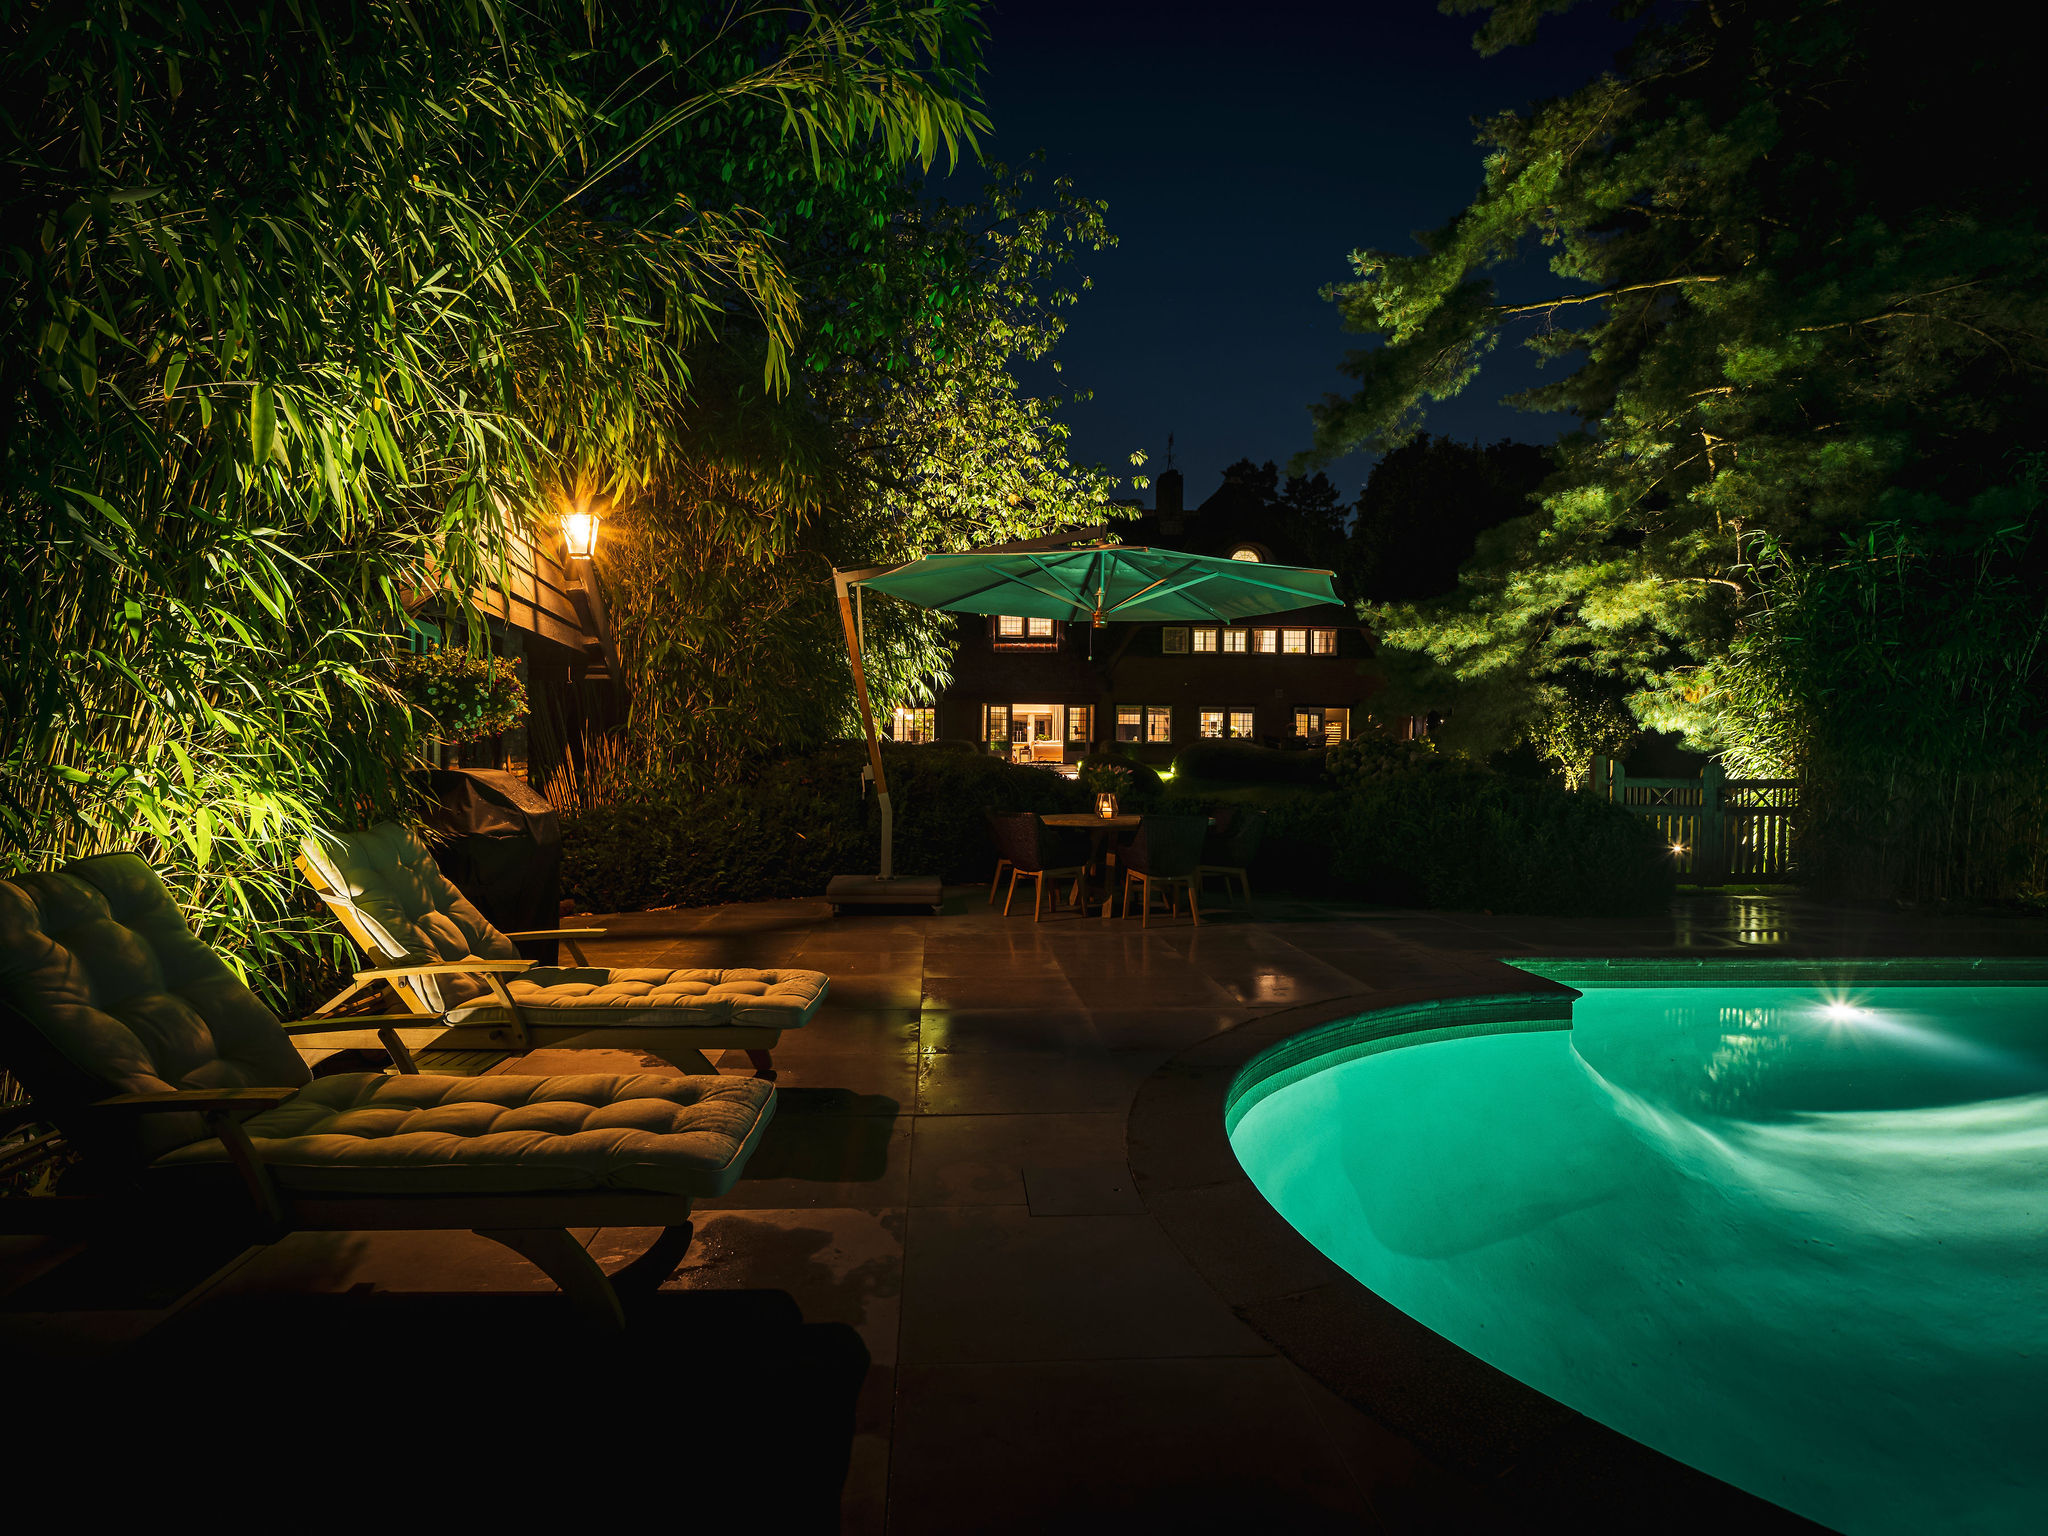 projecten zwembadverlichting buitenverlichting tuinarchitectuur rainforestlighting tuinverlichting regenwoud